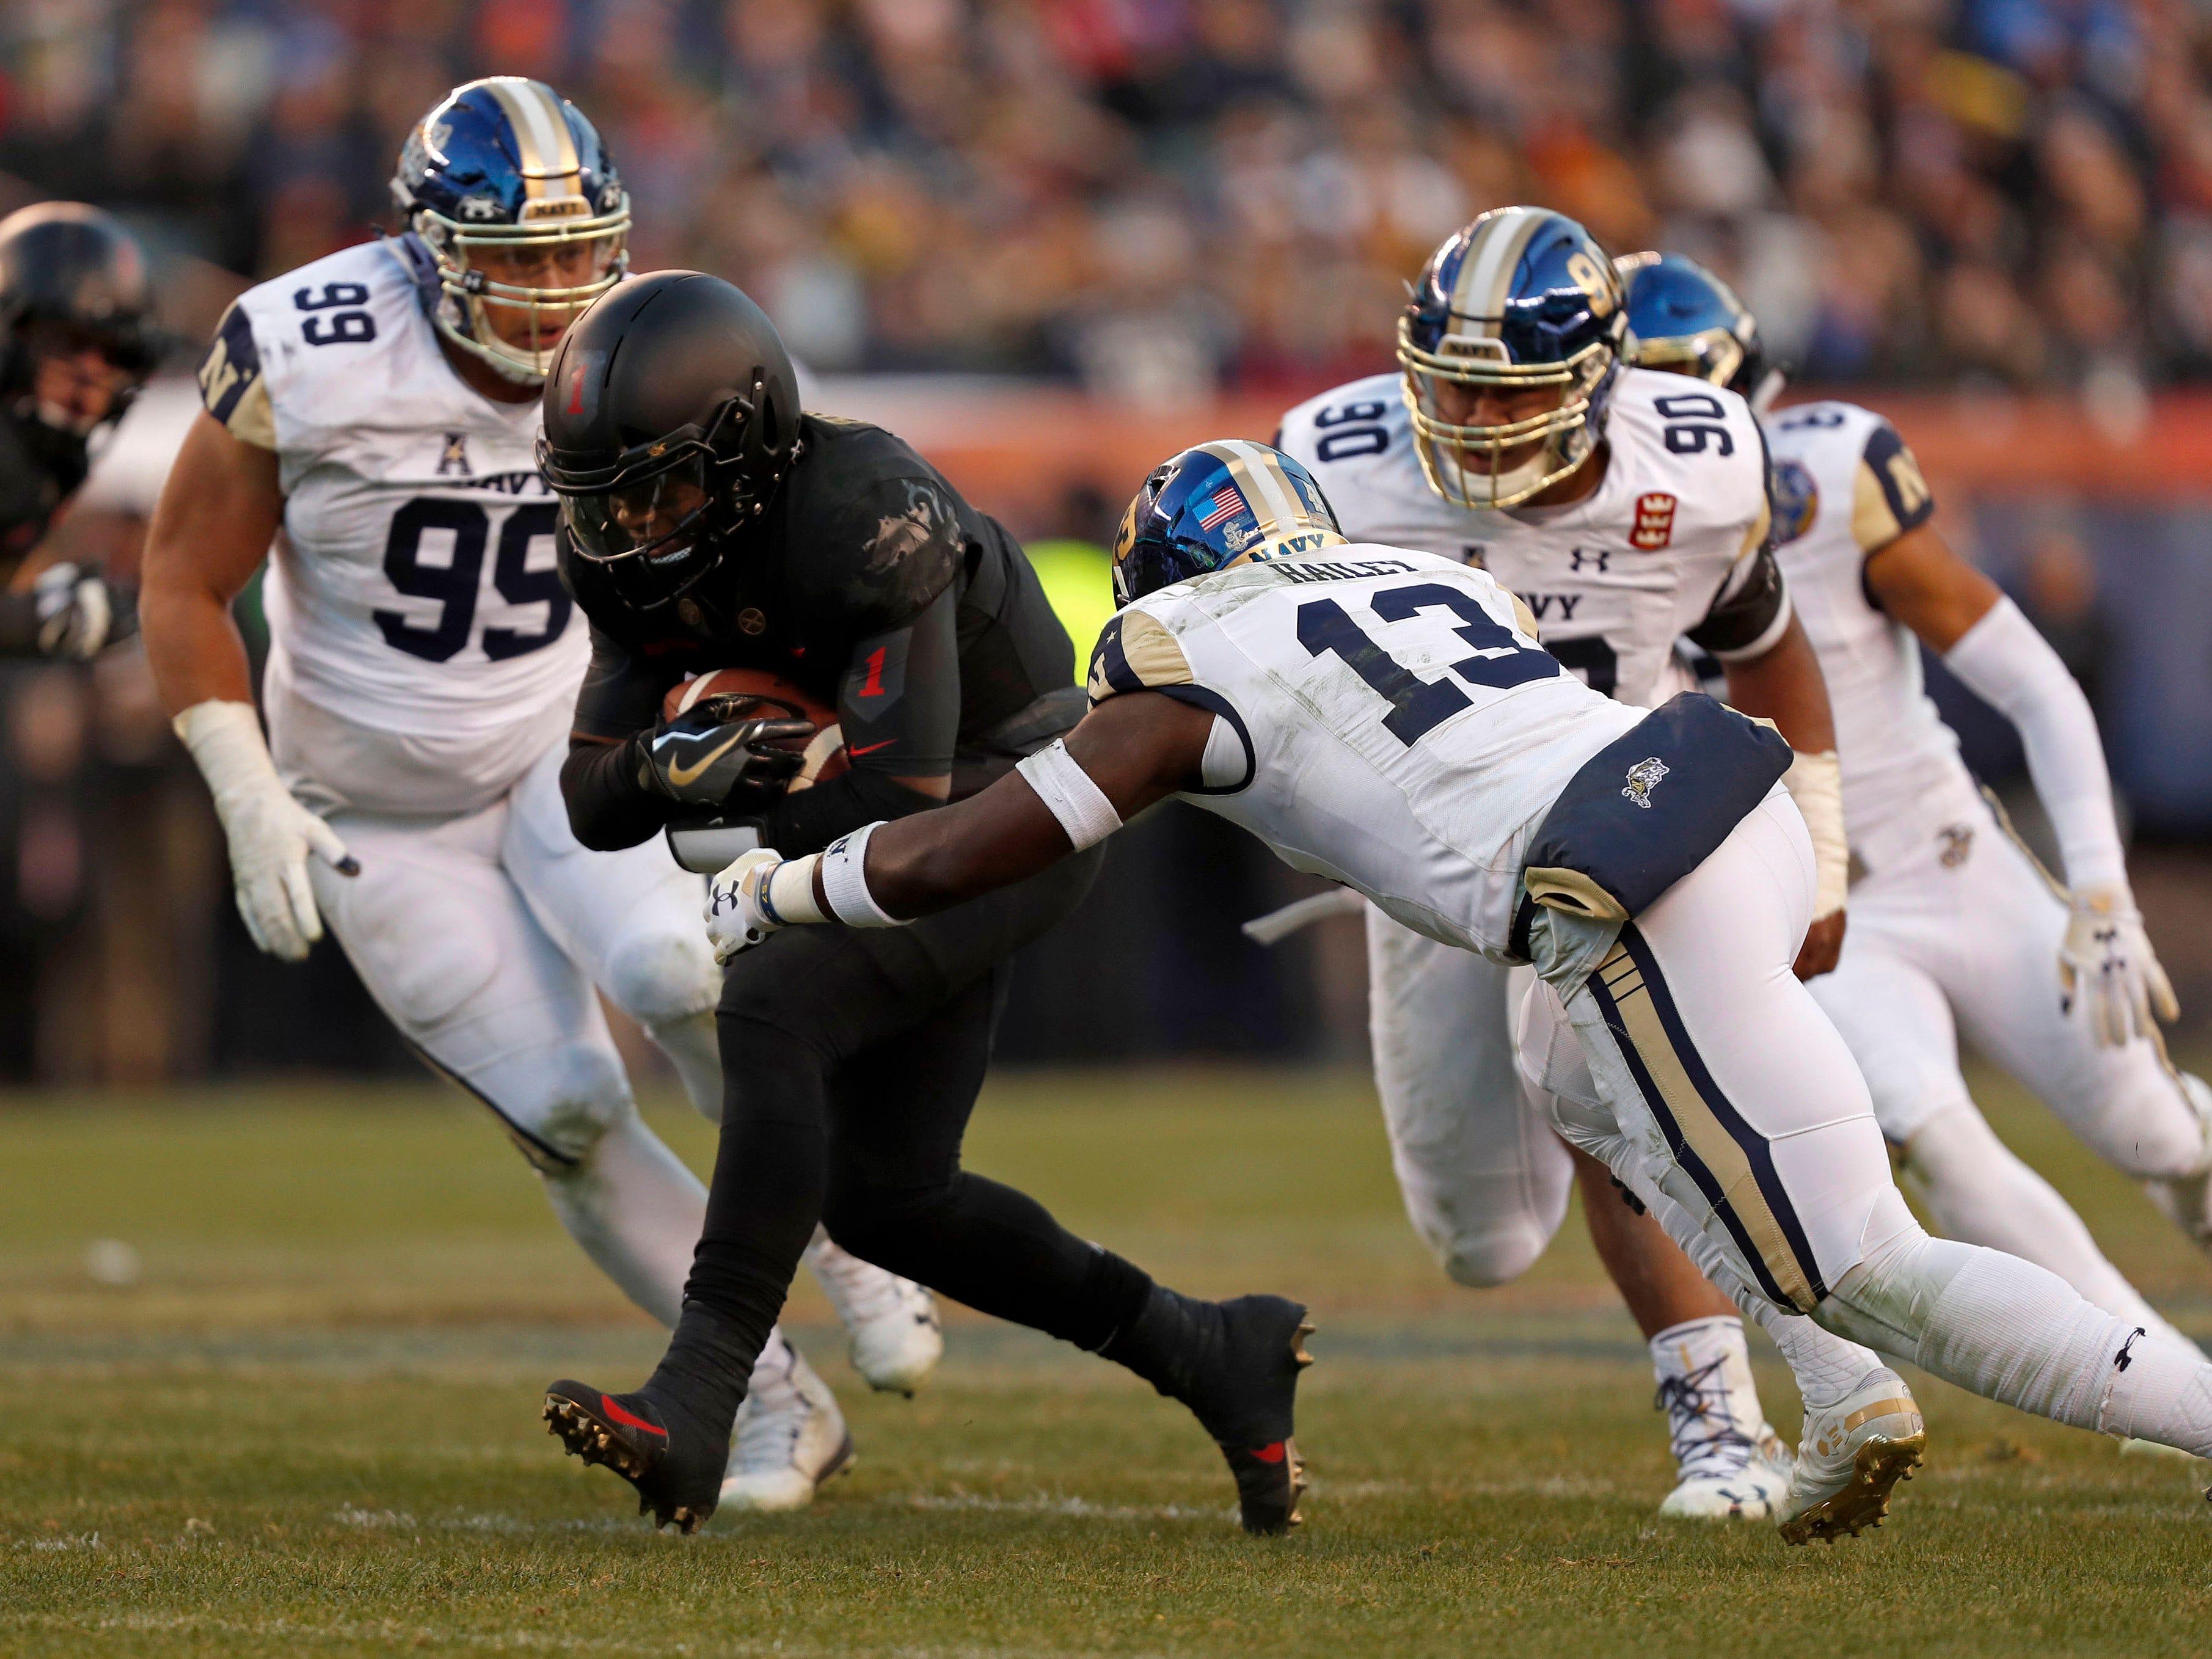 Army Black Knights quarterback Kelvin Hopkins Jr. runs the ball against Navy Midshipmen safety Juan Hailey during the first quarter.